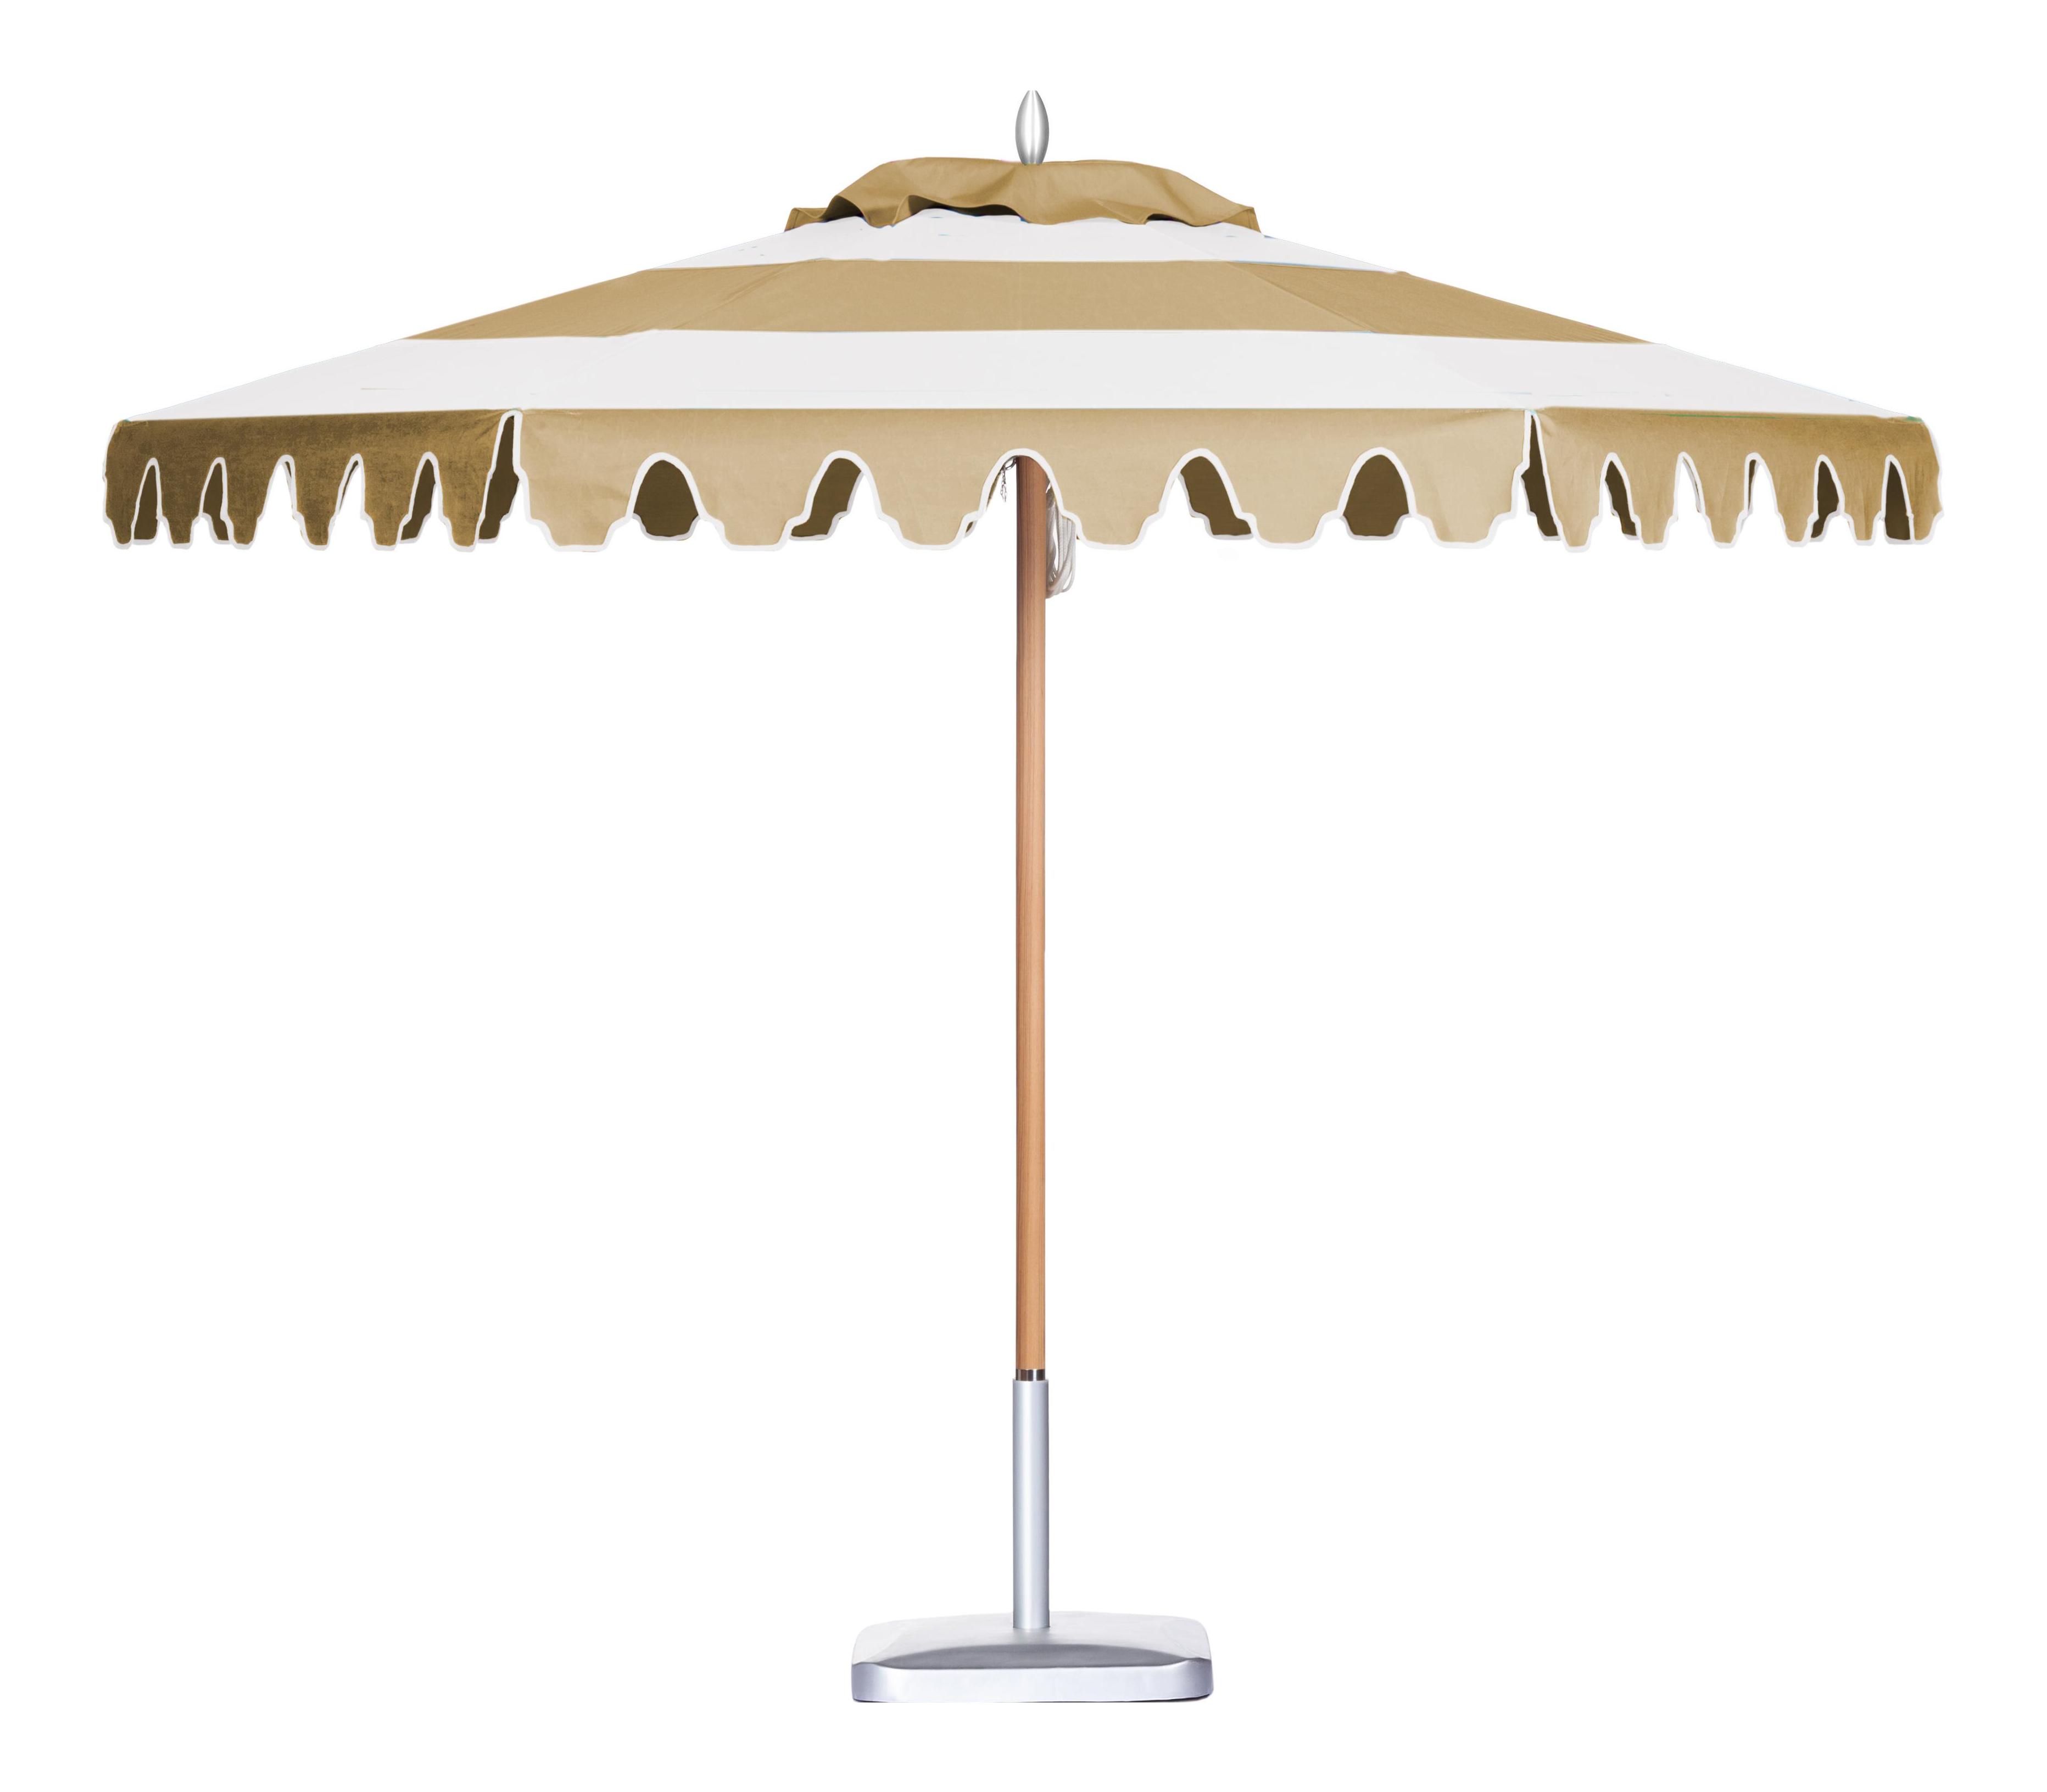 Desert Sand 9 Patio Umbrella Tan White In 2021 Patio Umbrella Umbrella Patio What is a market umbrella